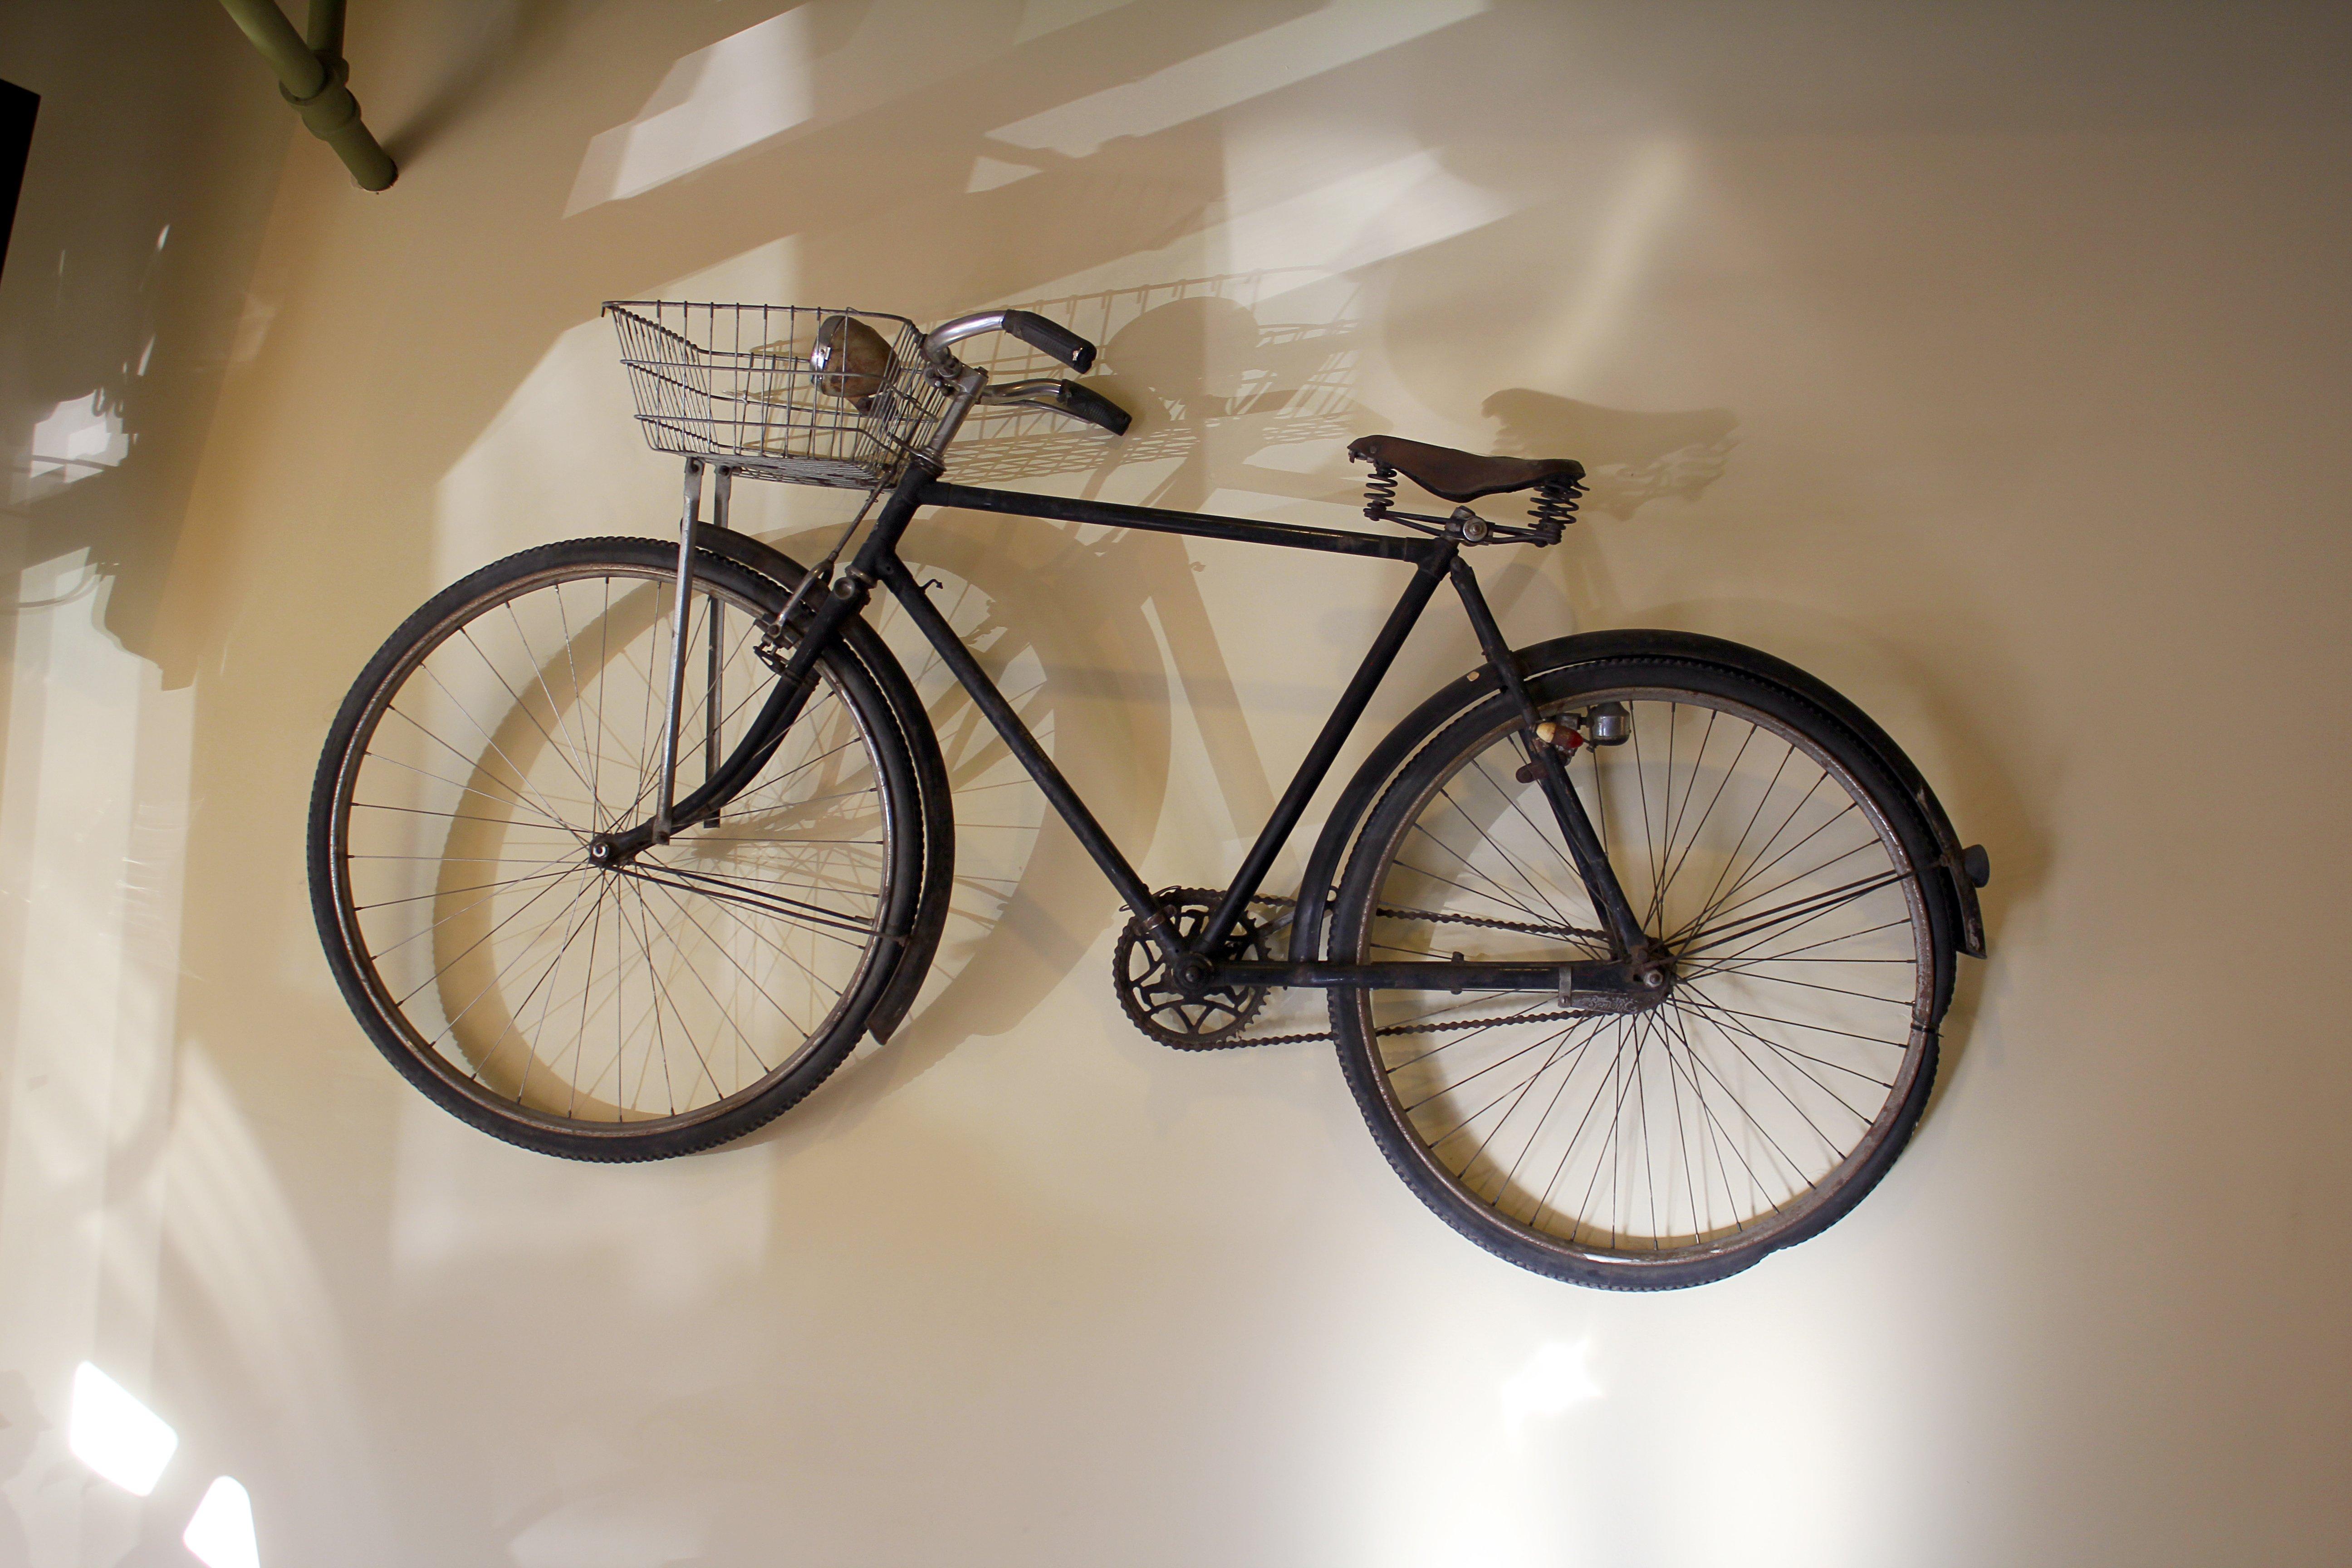 Street bicycle